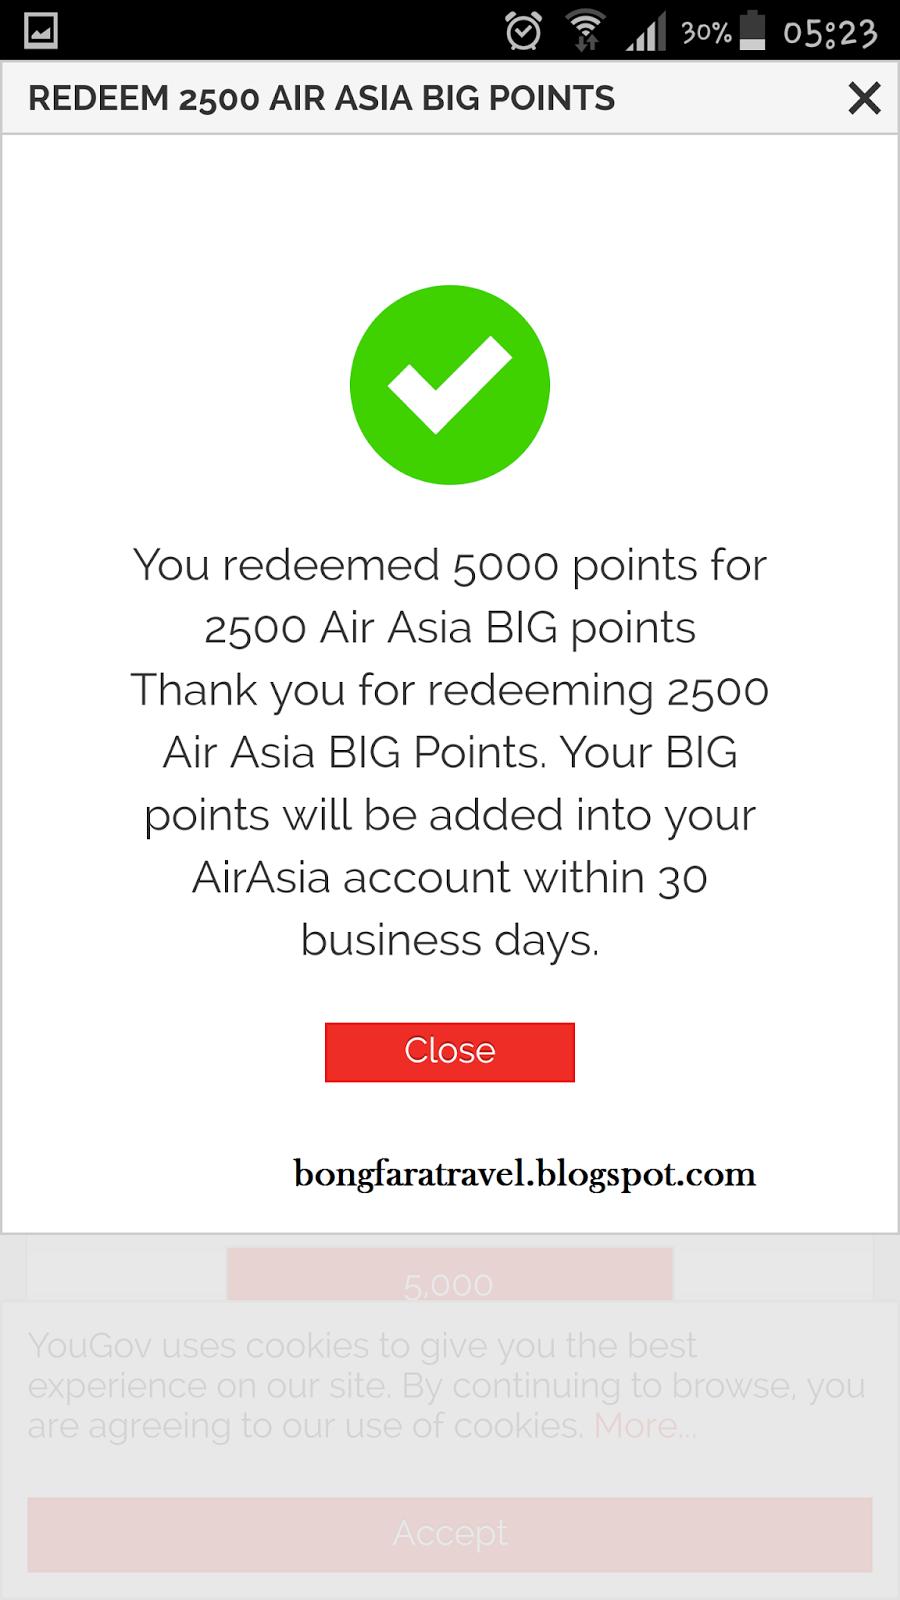 Travelog Bong Yougov Survey Cara Mudah Mendapatkan Airasia Big Poin Point Air Asia Less Than Two Weeks Dari Tarikh Aku Redeem Points Masuk Dah Yay